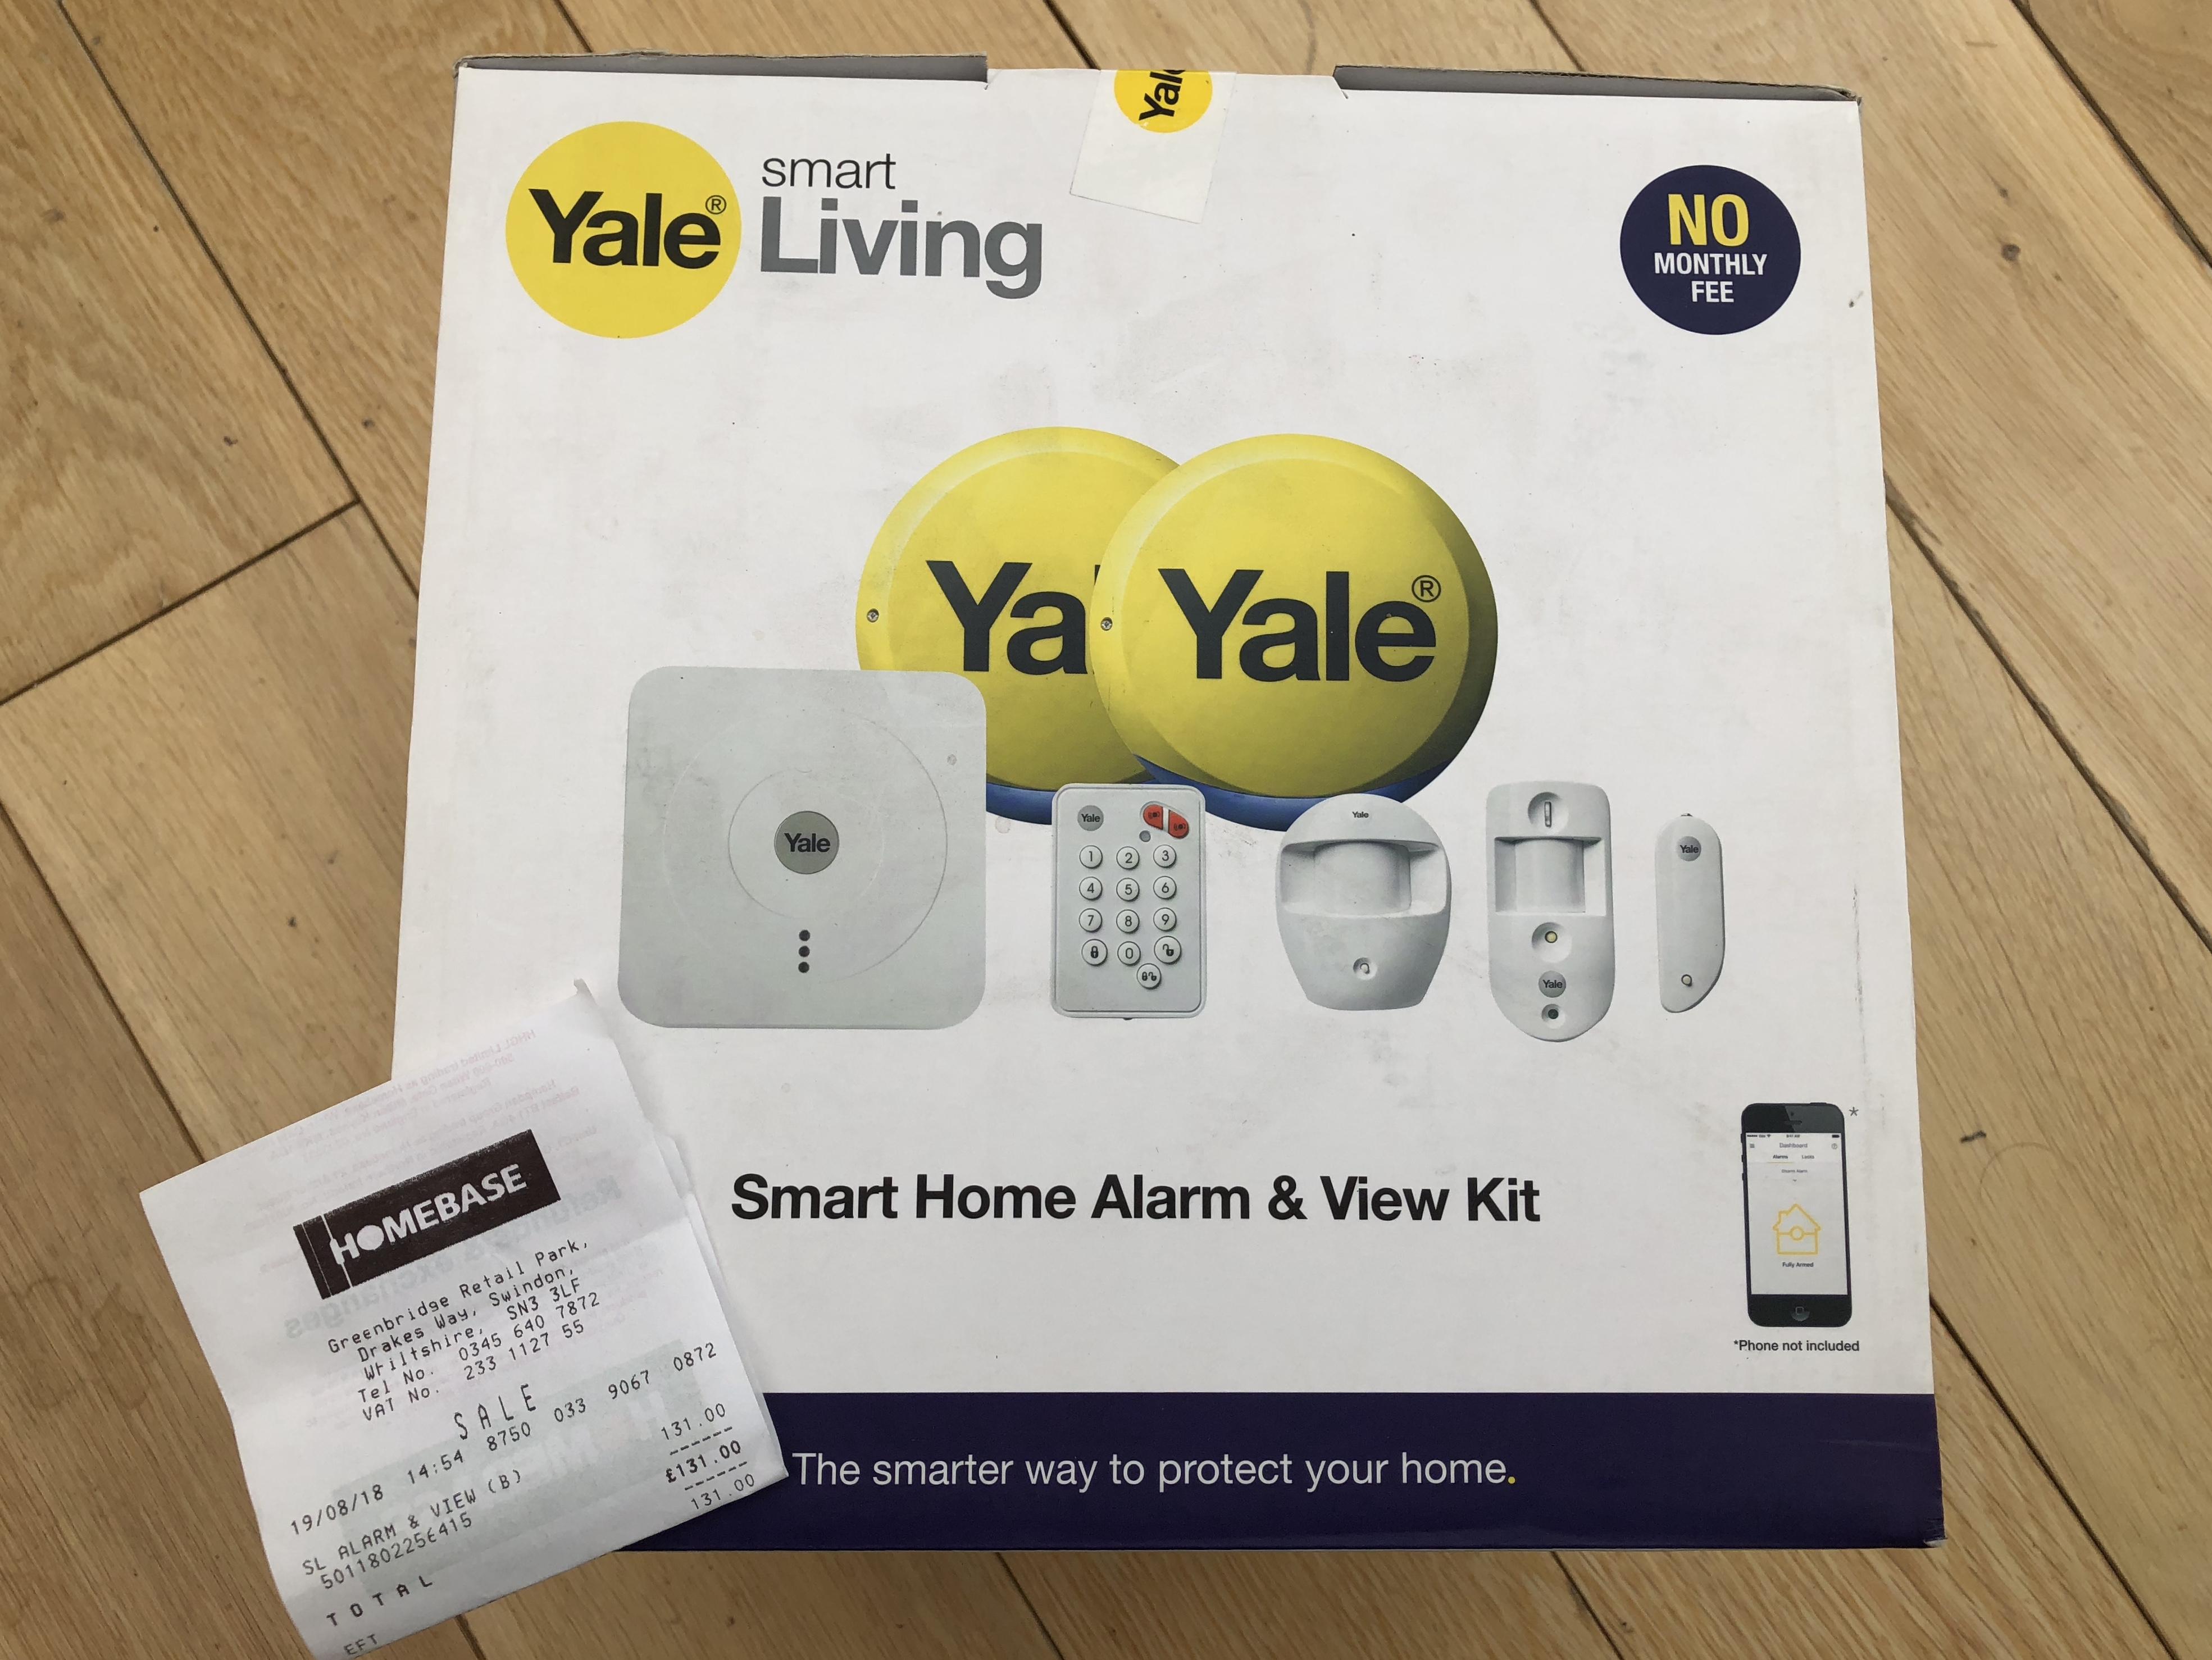 Yale Smart Home Alarm & View Kit - SR-330 £131 instore @ Homebase